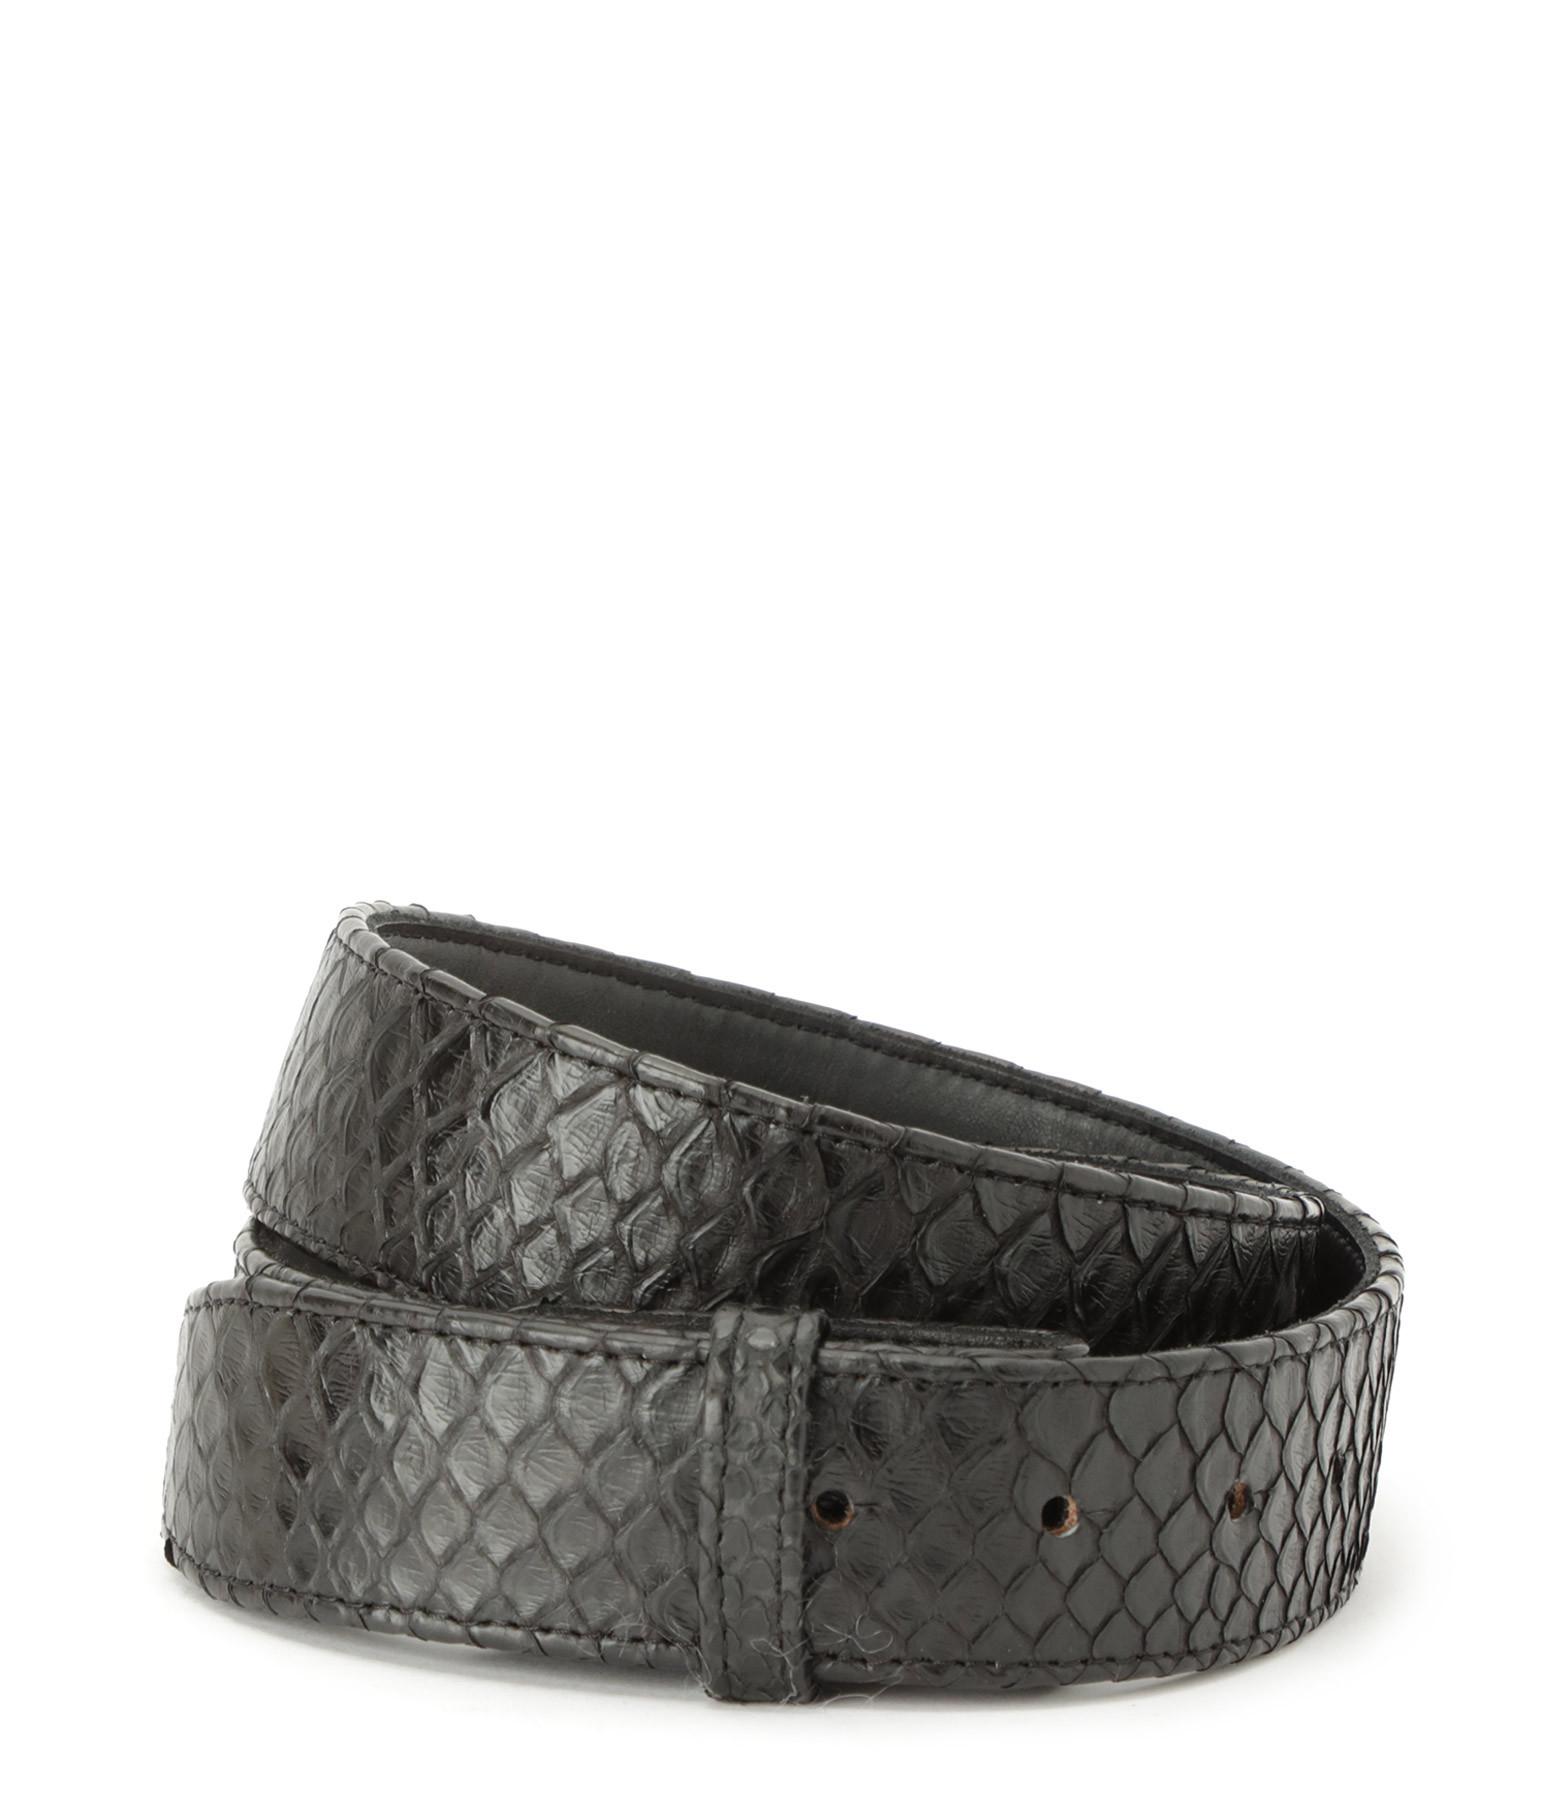 CLARIS VIROT - Sangle de Ceinture Cuir Python Noir